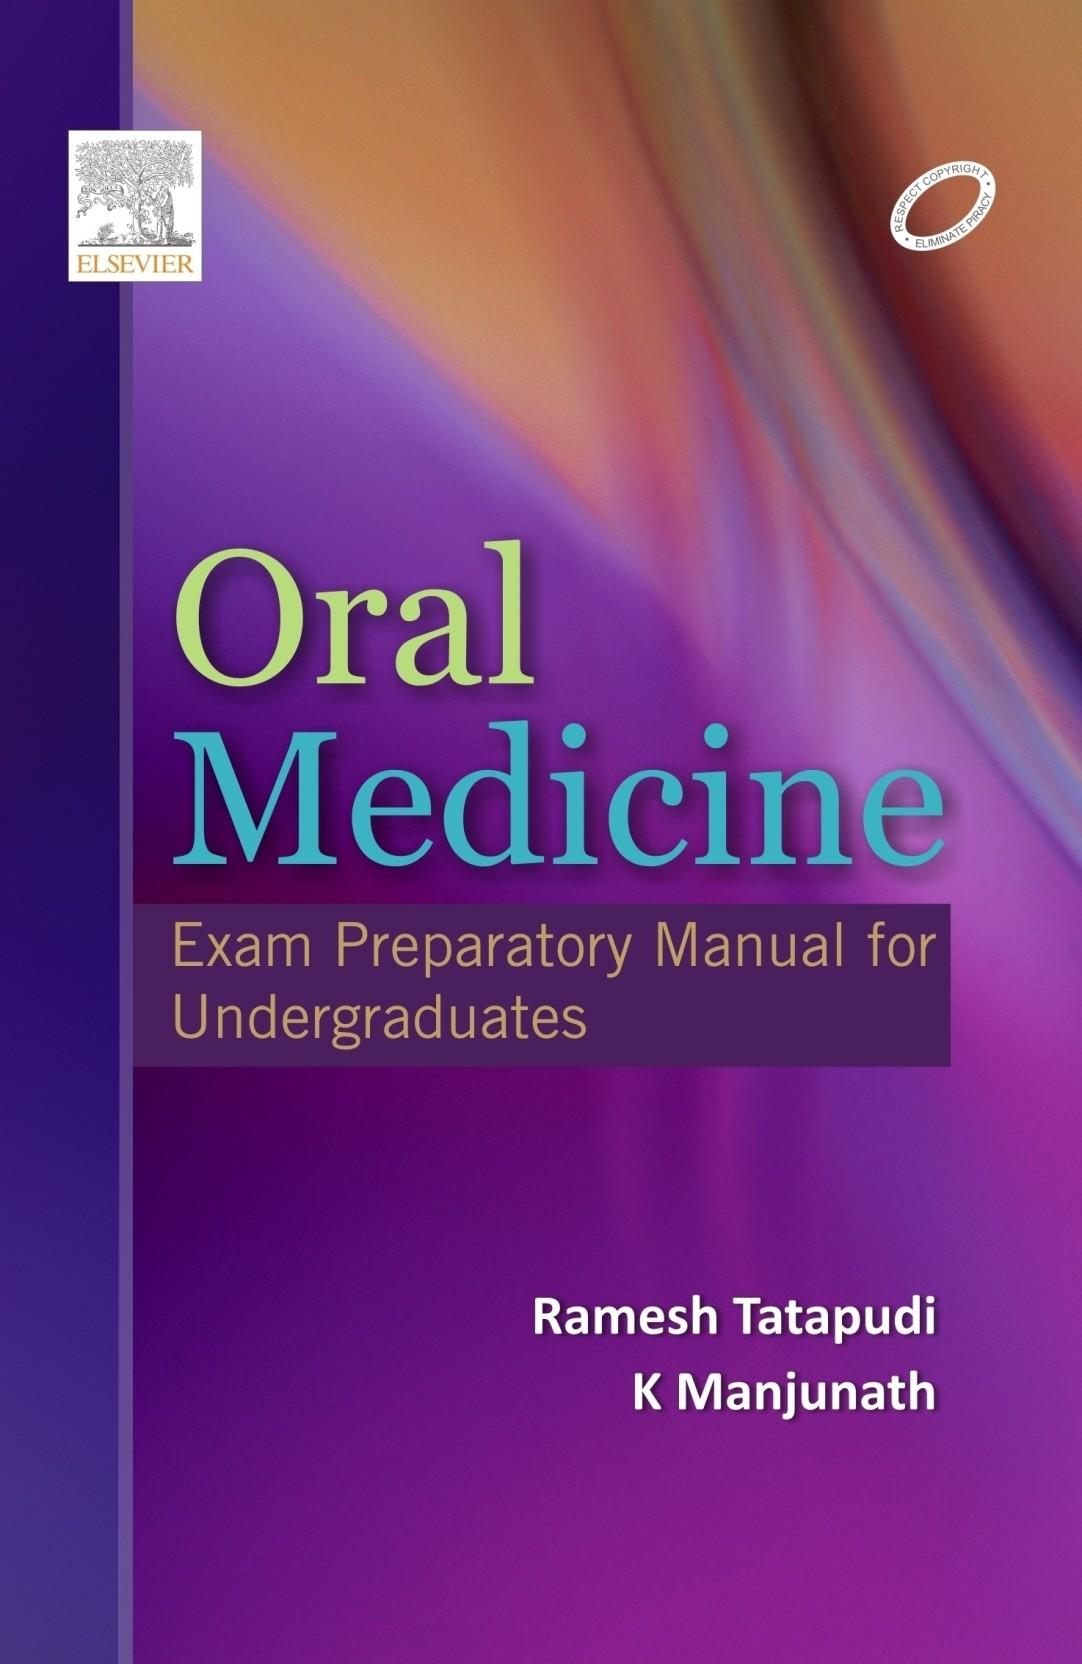 Oral Medicine: Exam Preparatory Manual for Undergraduates. ADD TO CART